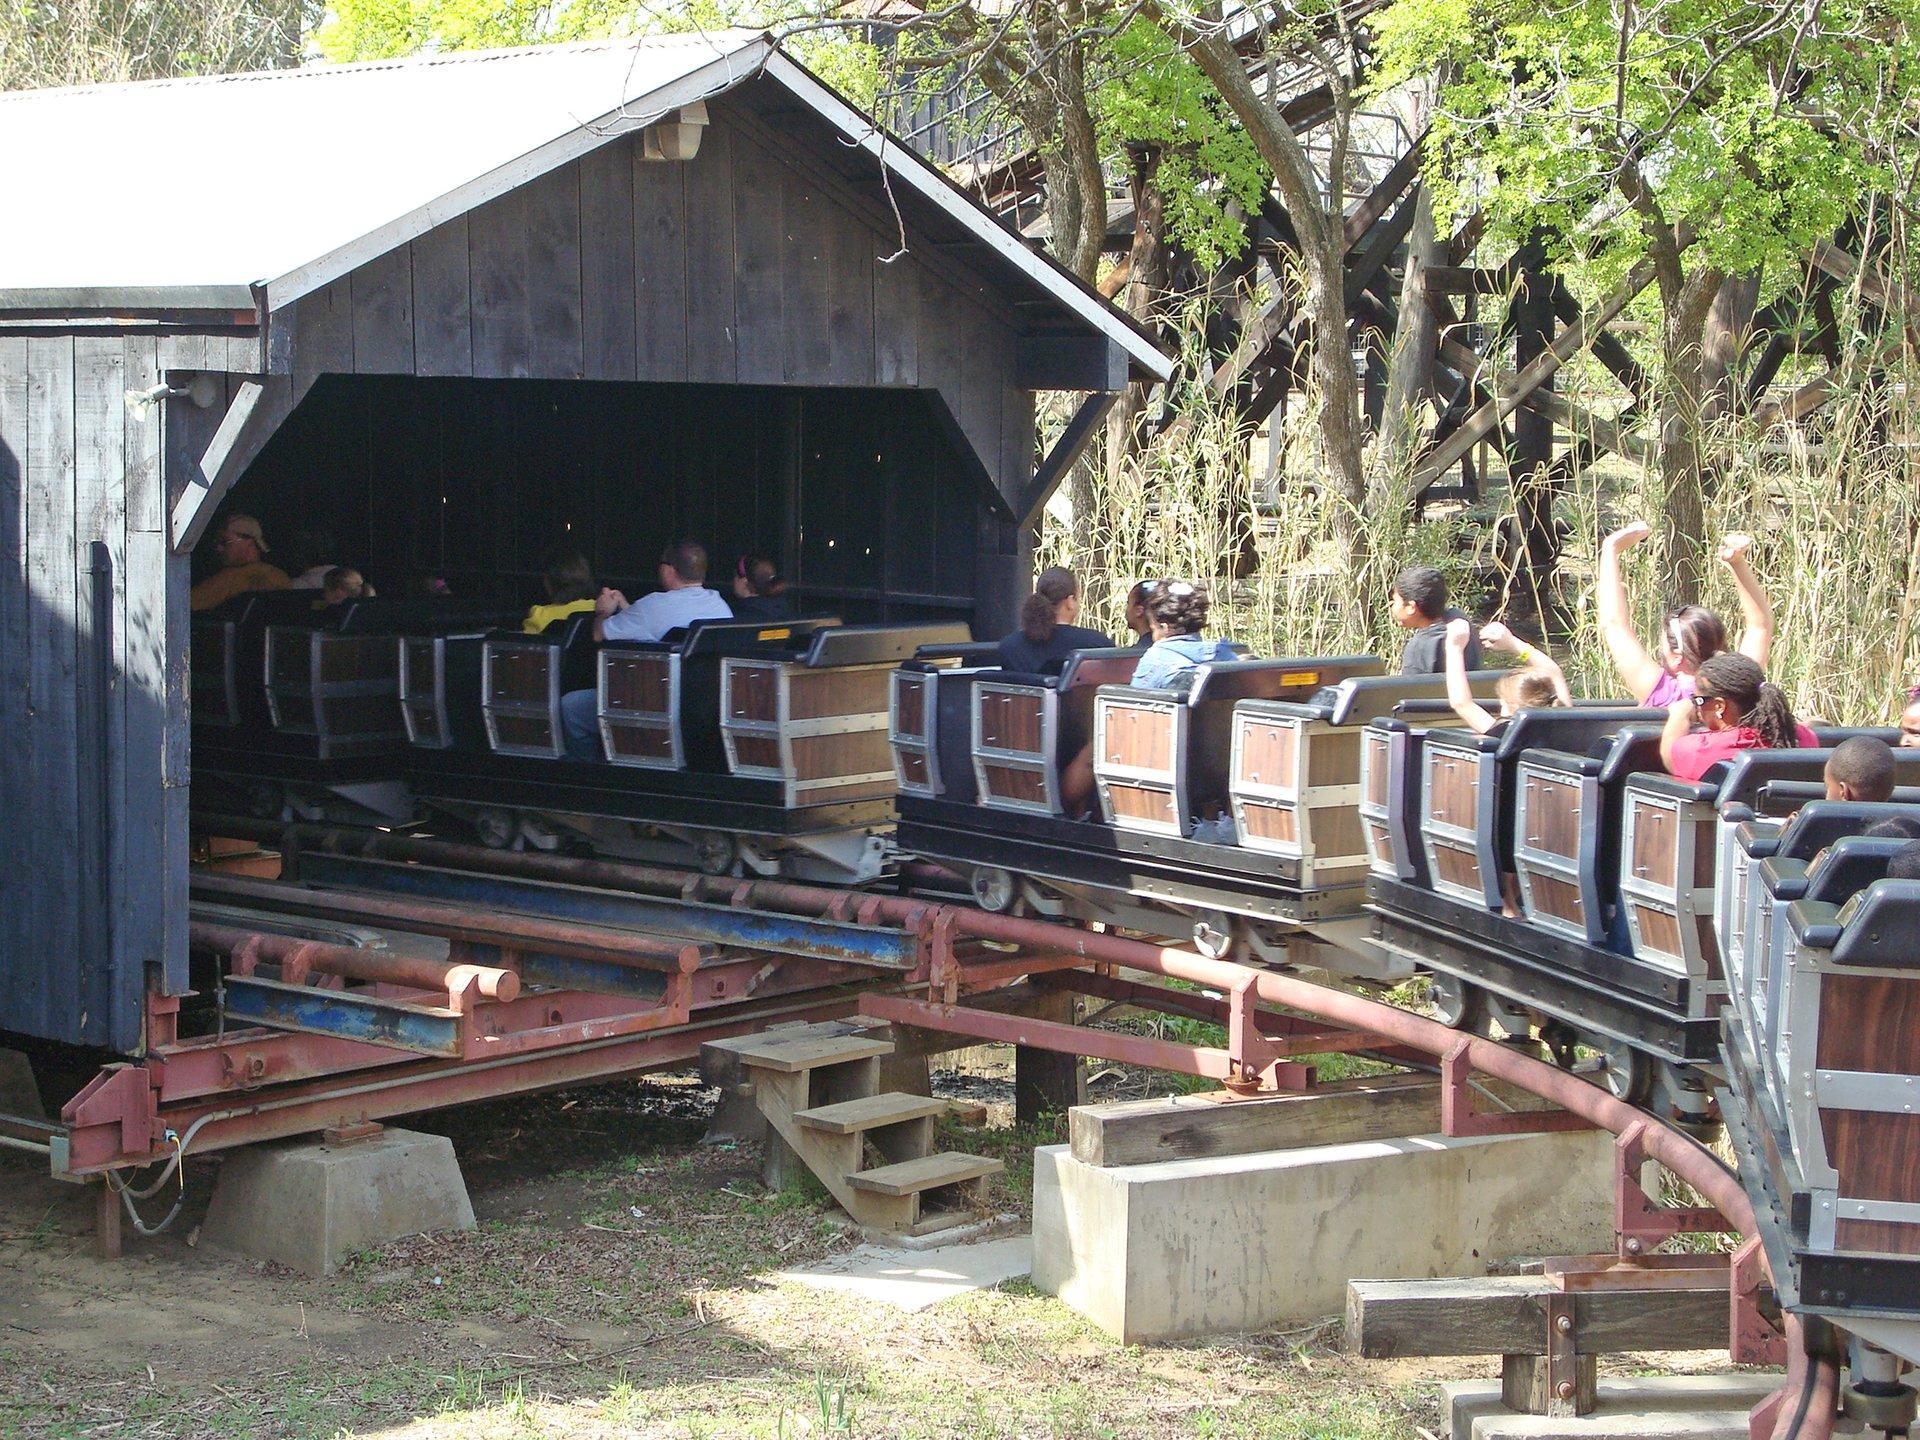 Runaway Mine Train | Six Flags Over Texas